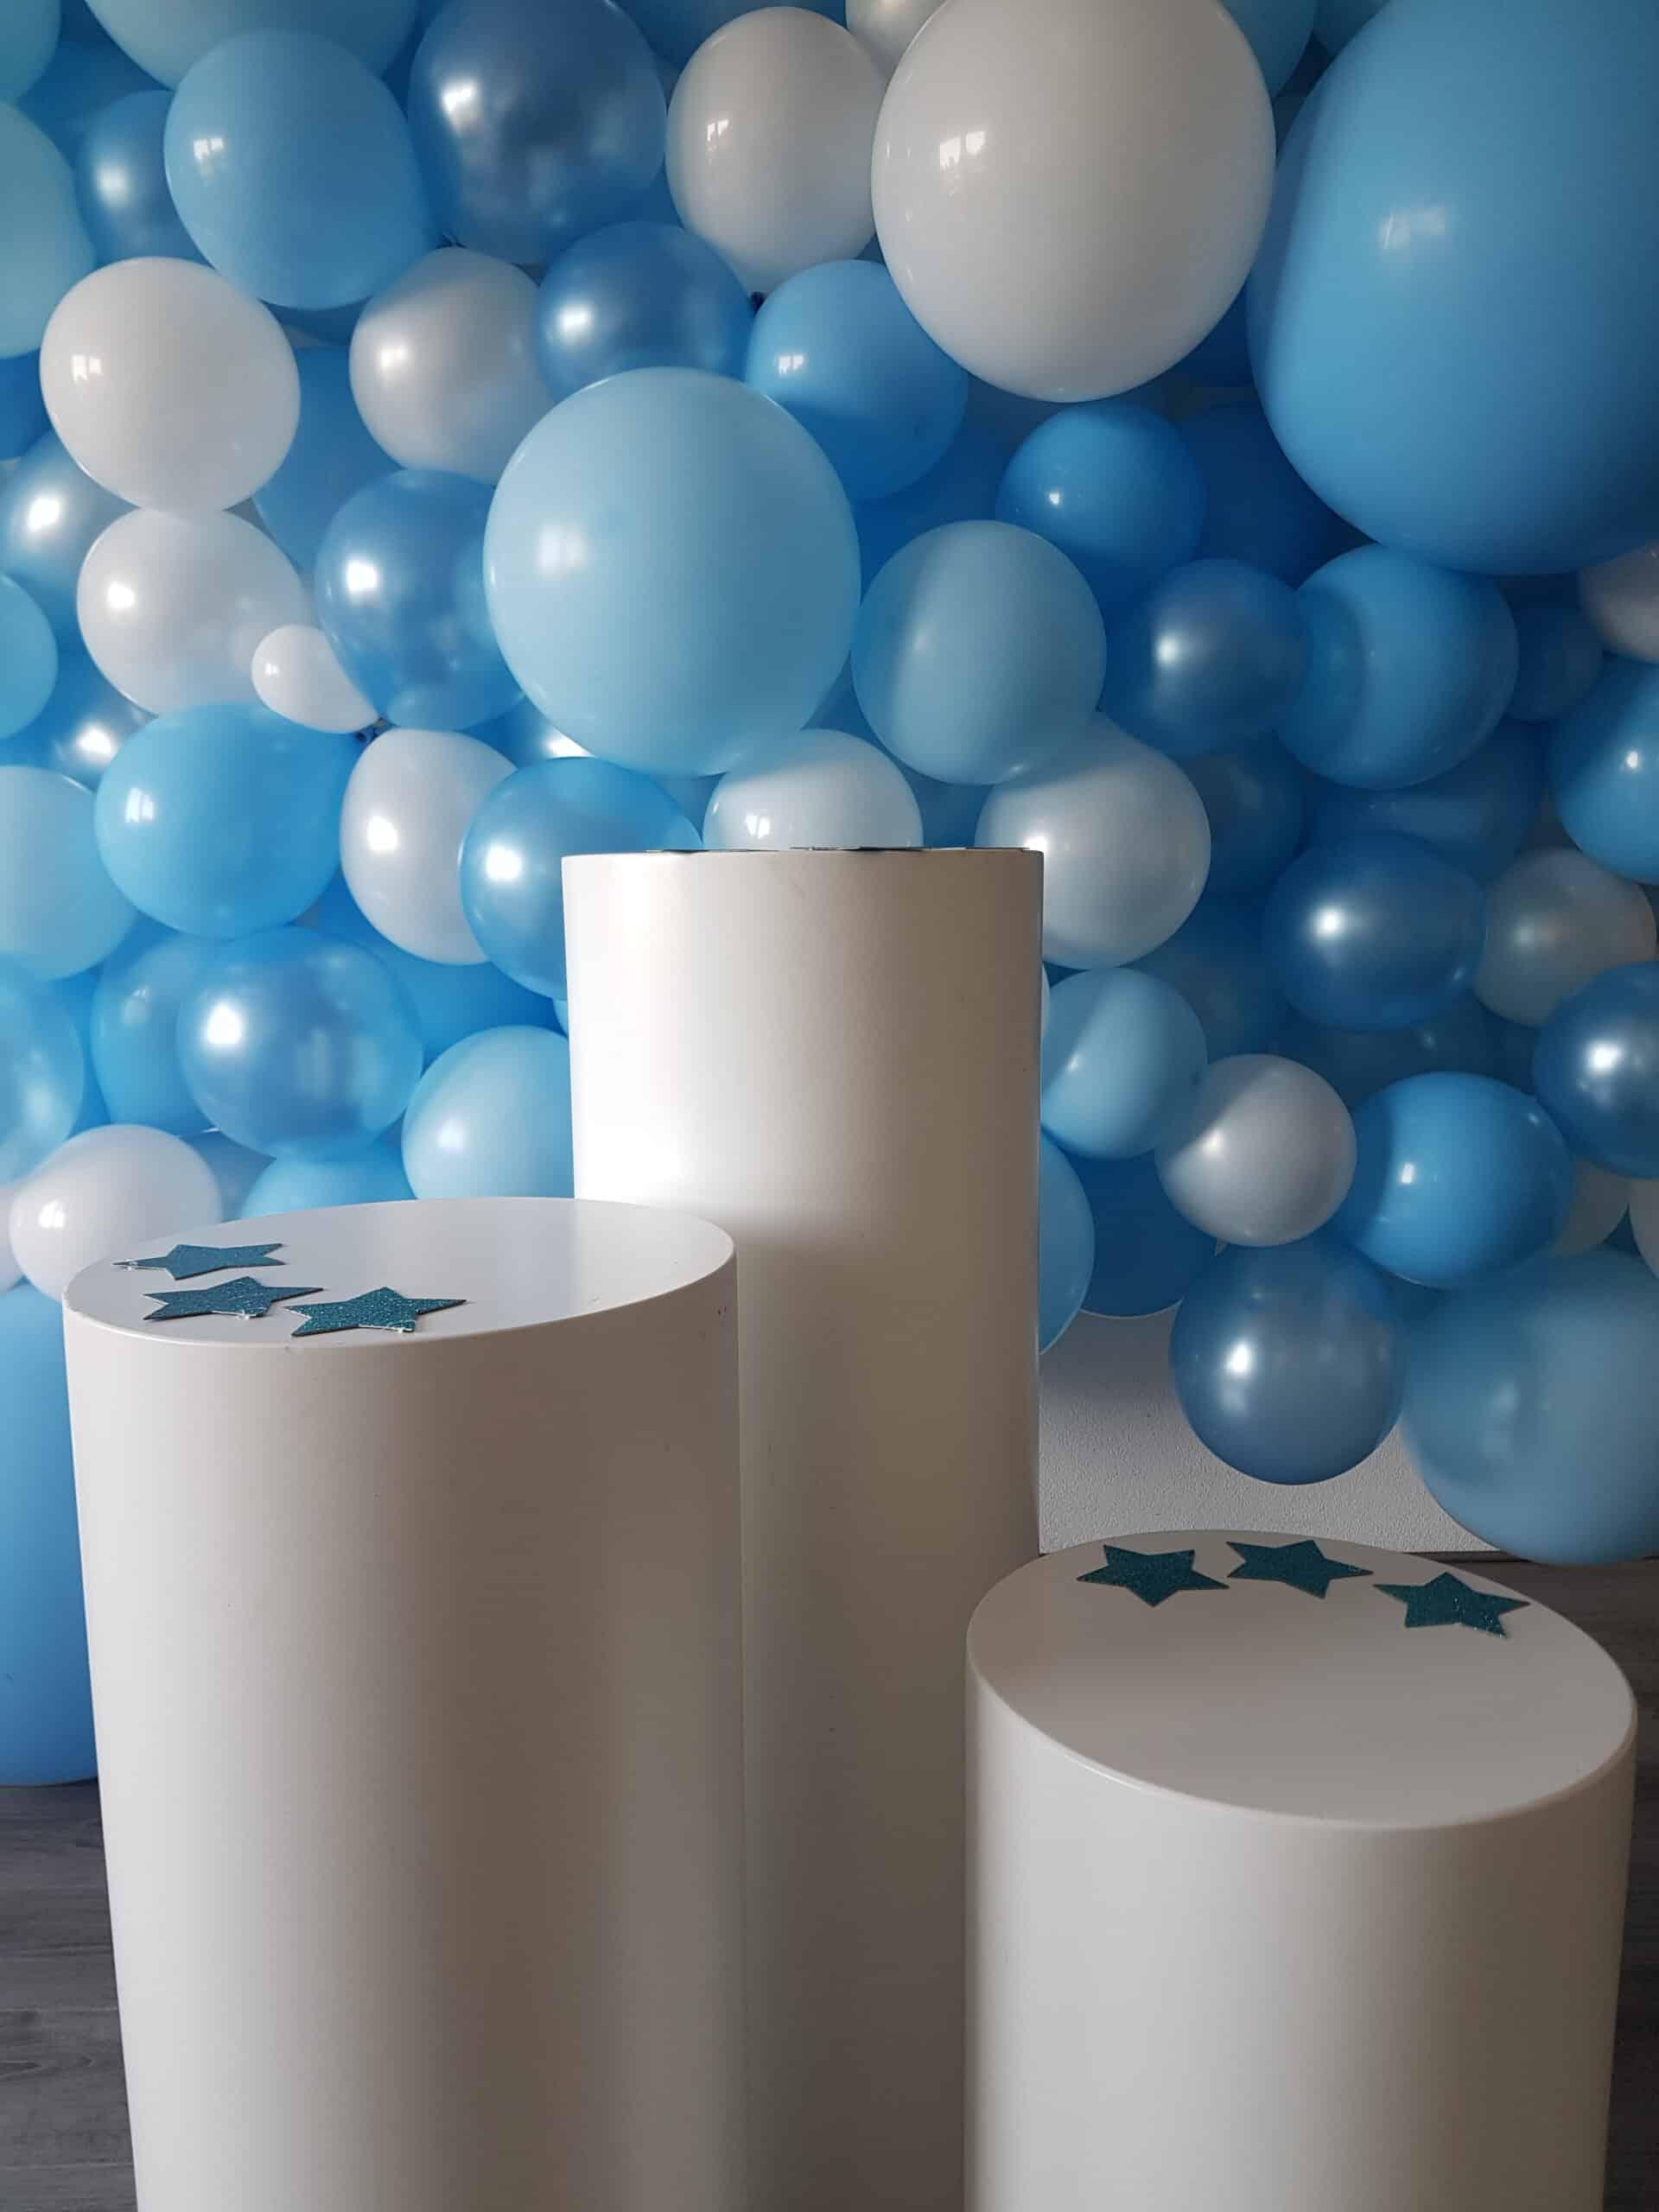 20190921 112921 scaled - Organic ballondecoratie van allerlei maten ballonnen